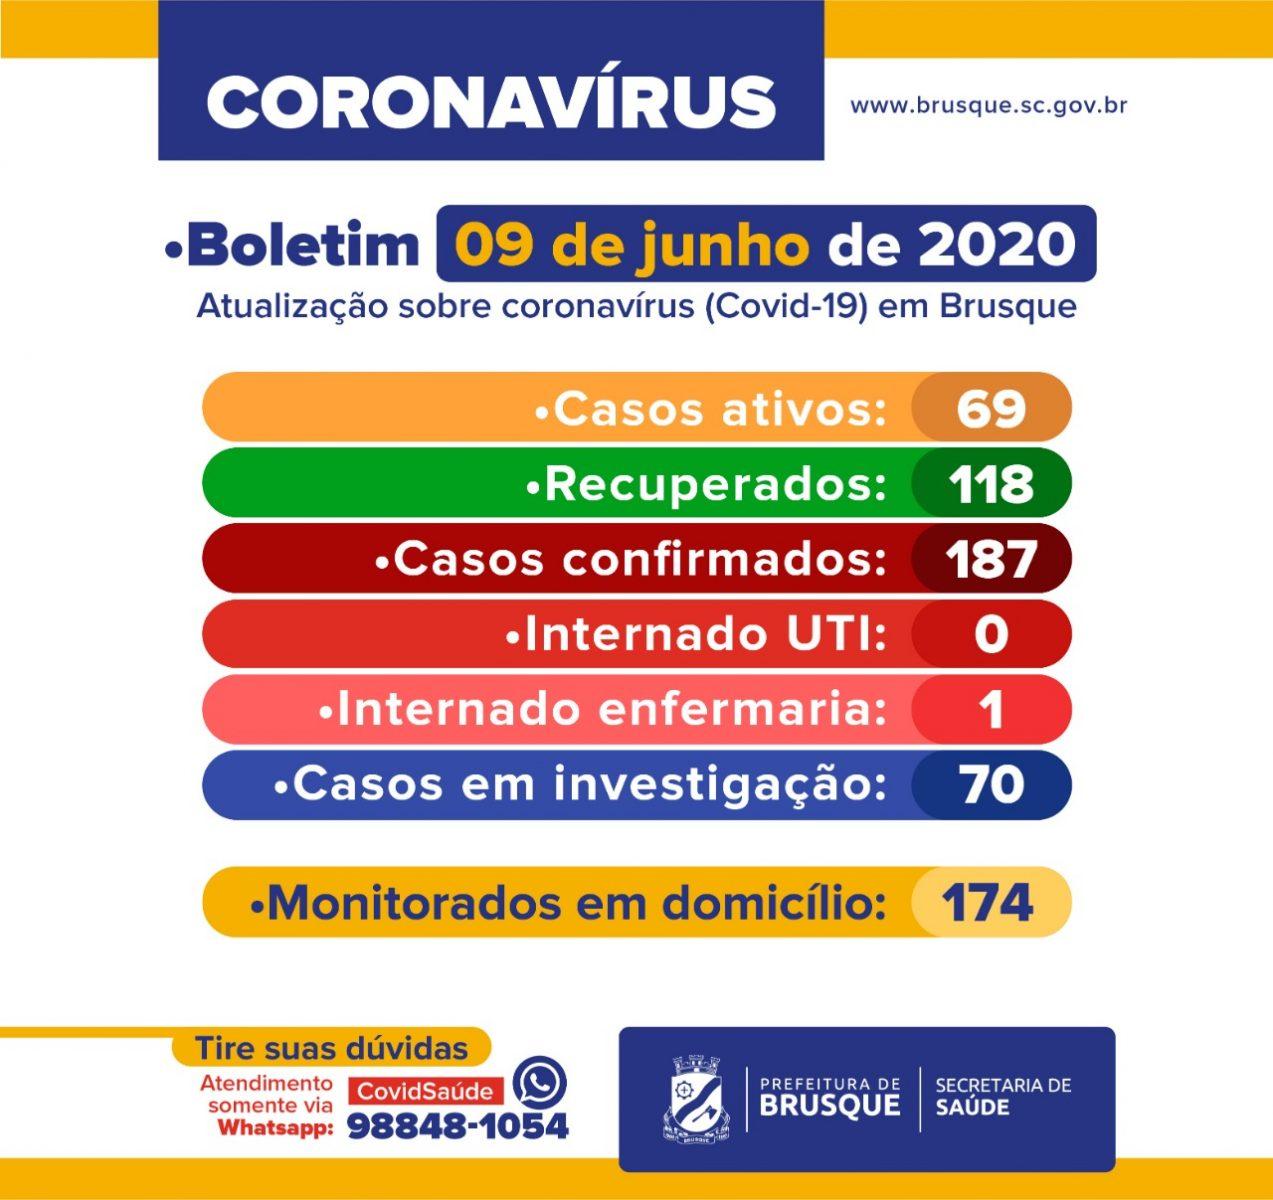 Confira o Boletim Epidemiológico da Prefeitura de Brusque desta terça-feira (09)